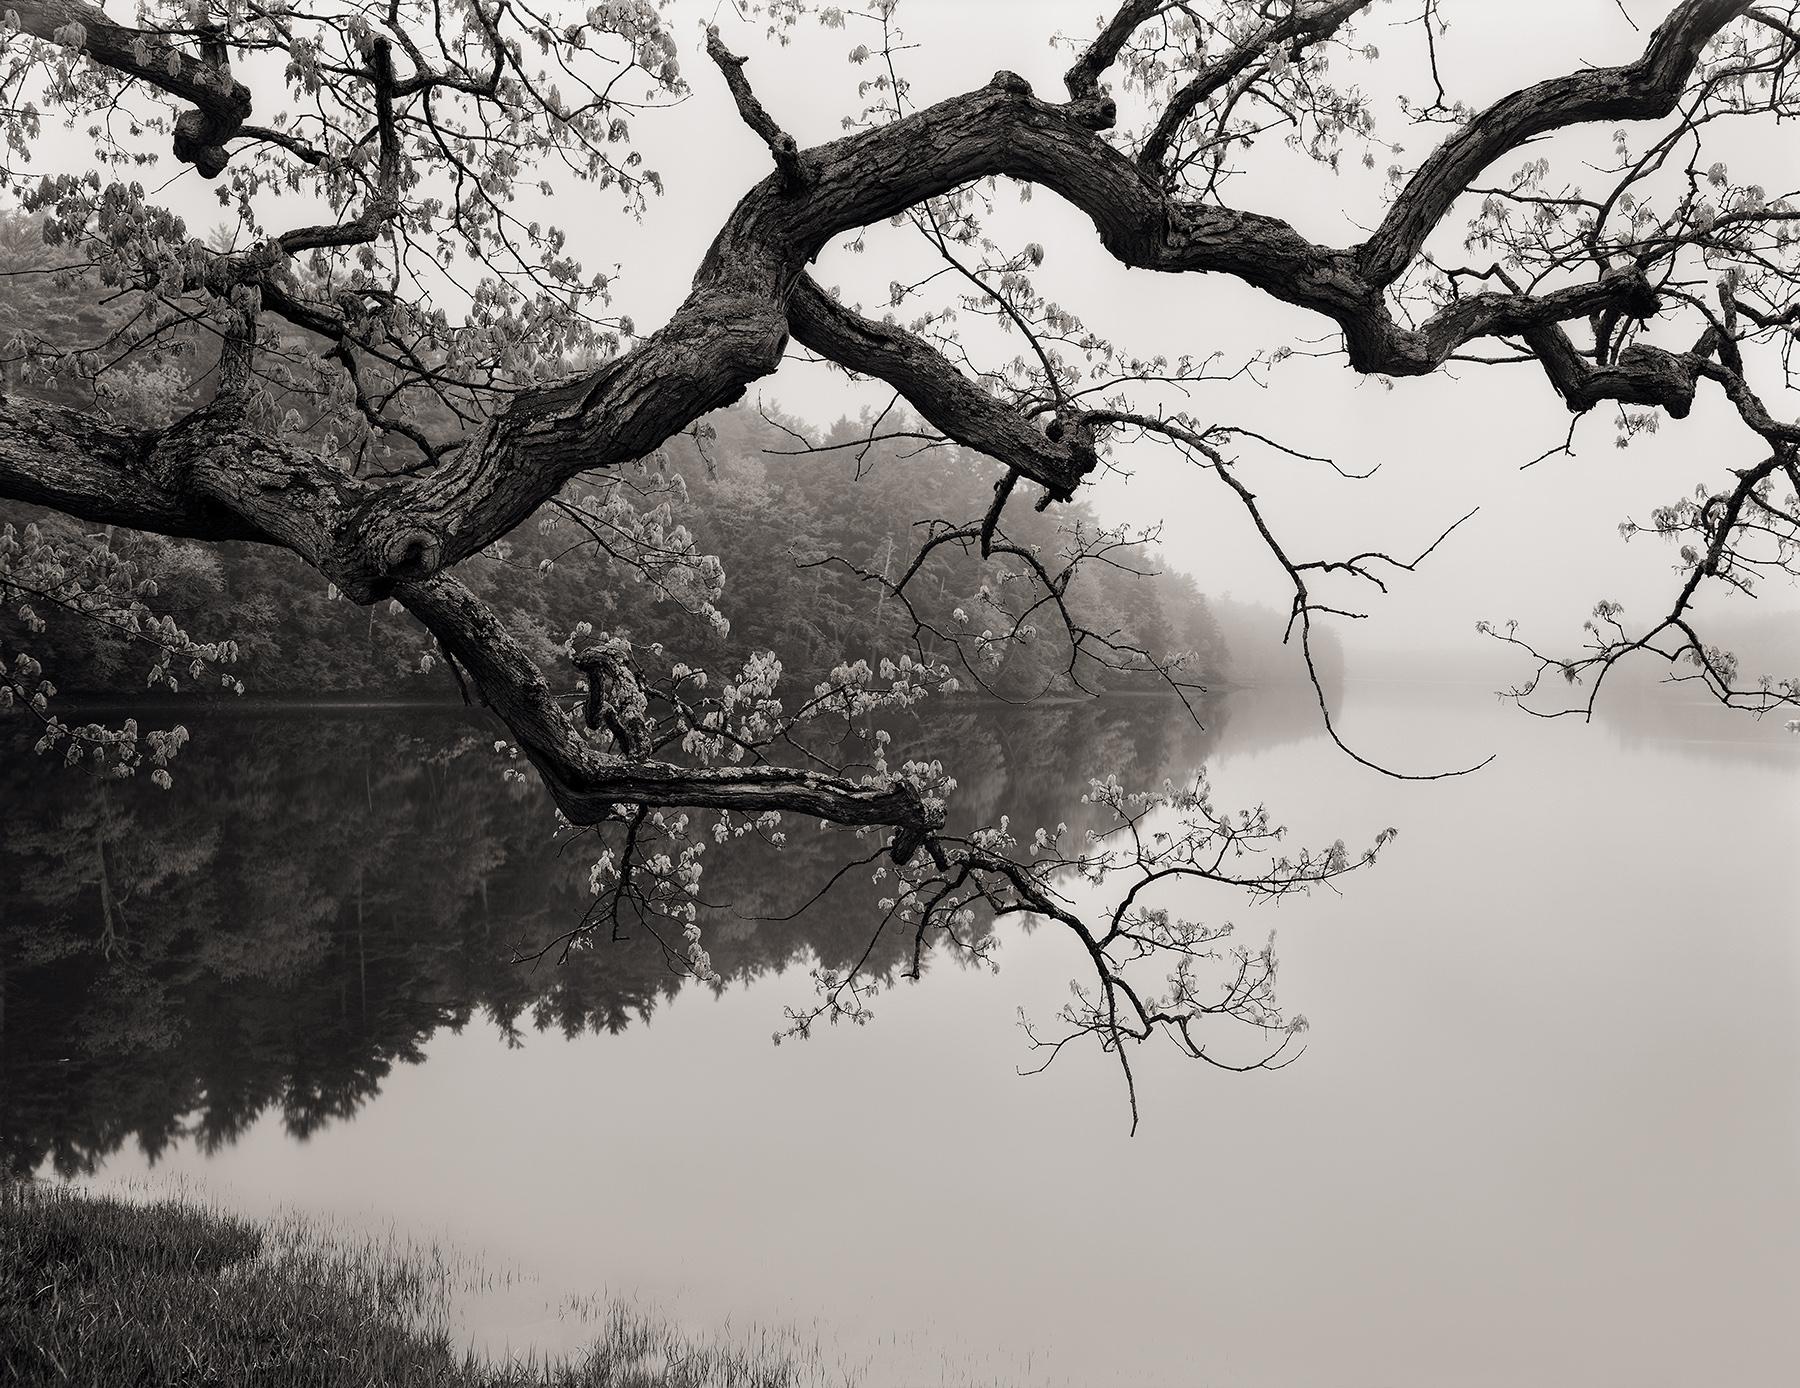 Salmon Fall s River #1